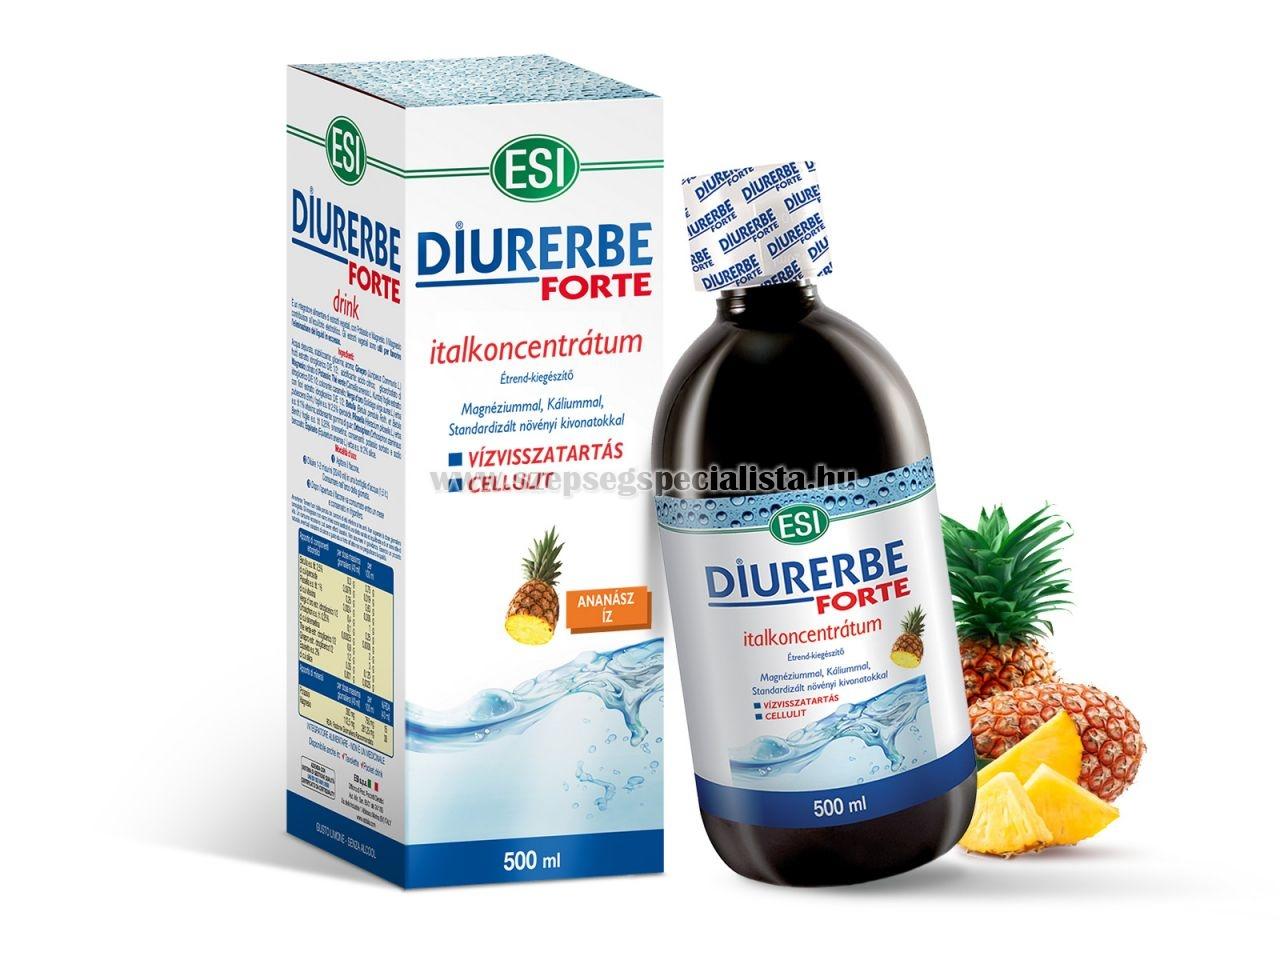 ESI Diurerbe Forte italkoncentrátum ananász íz 500ml